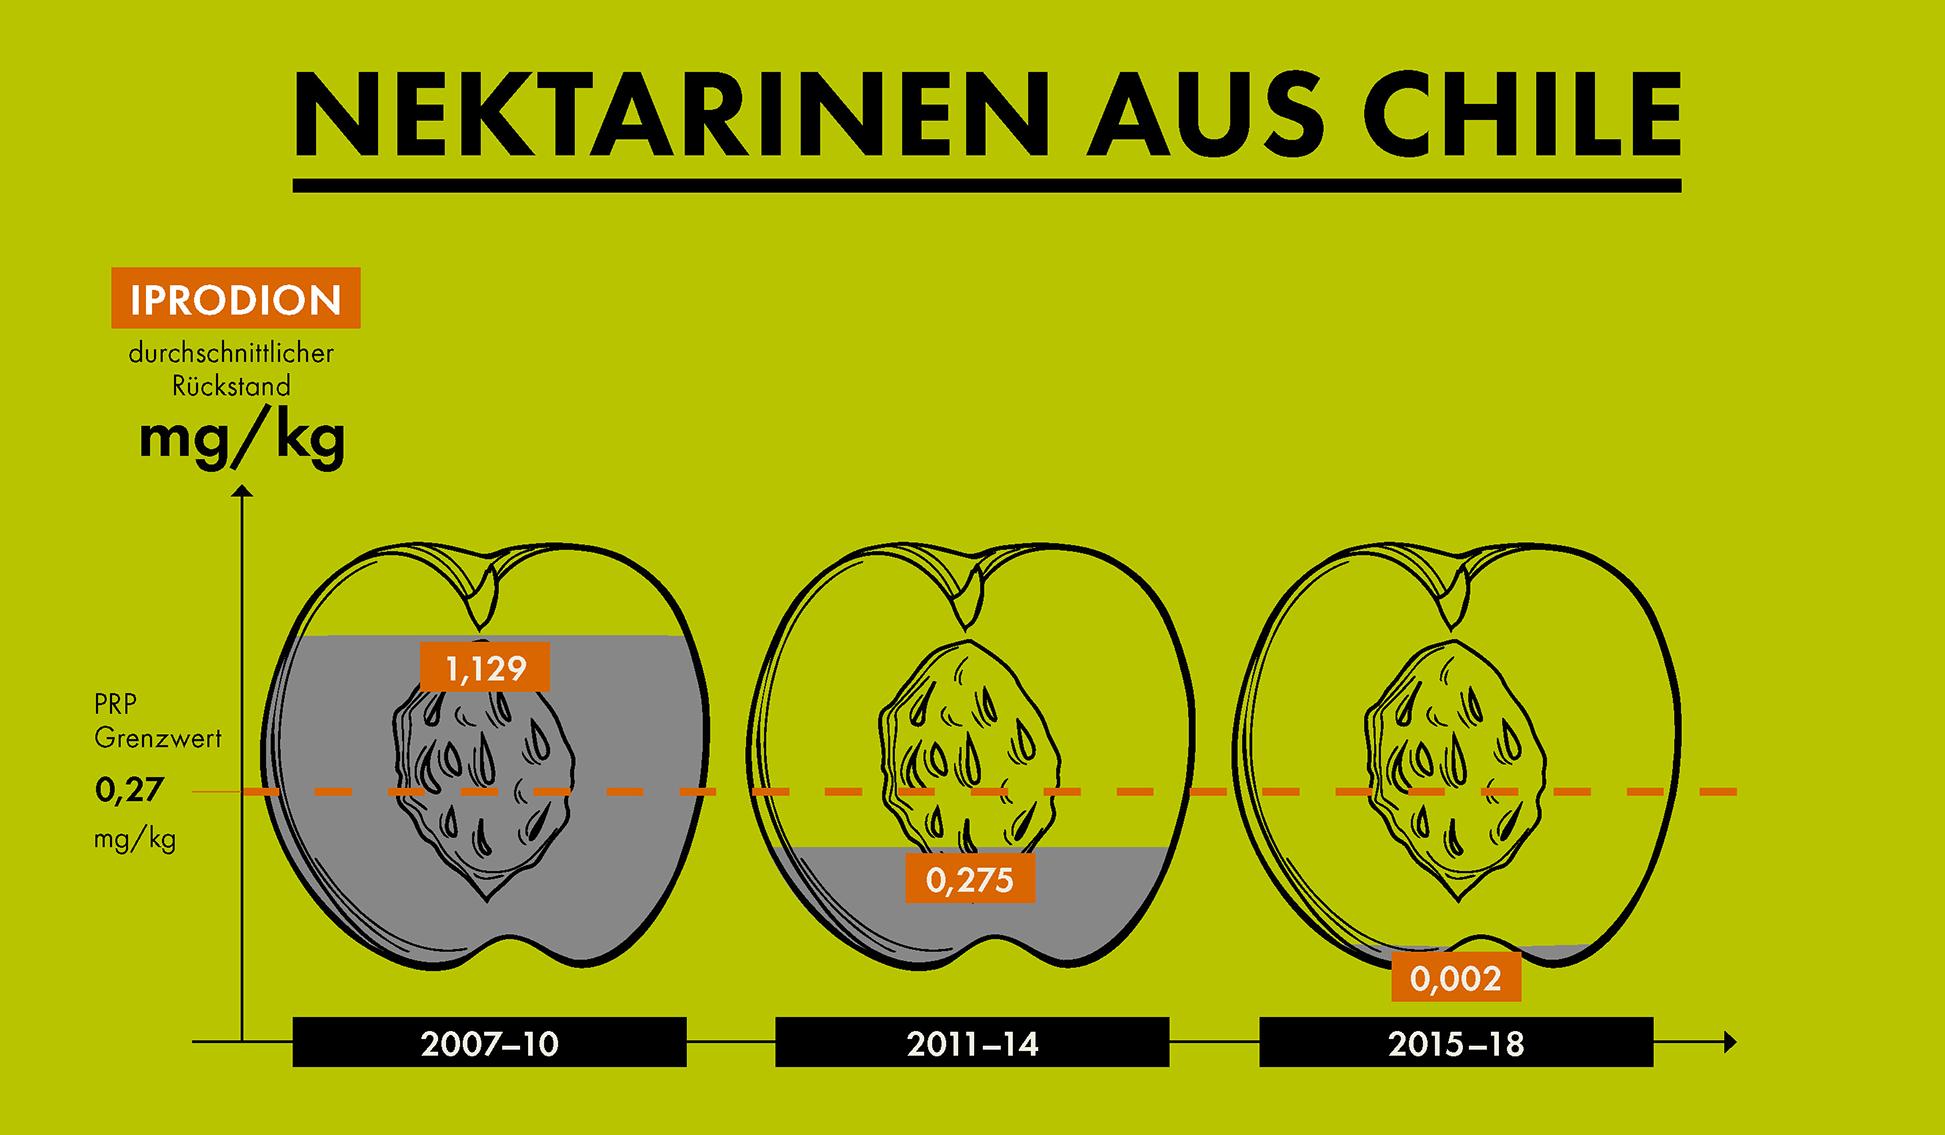 Grafik PRP Erfolge: Nektarinen aus Chile